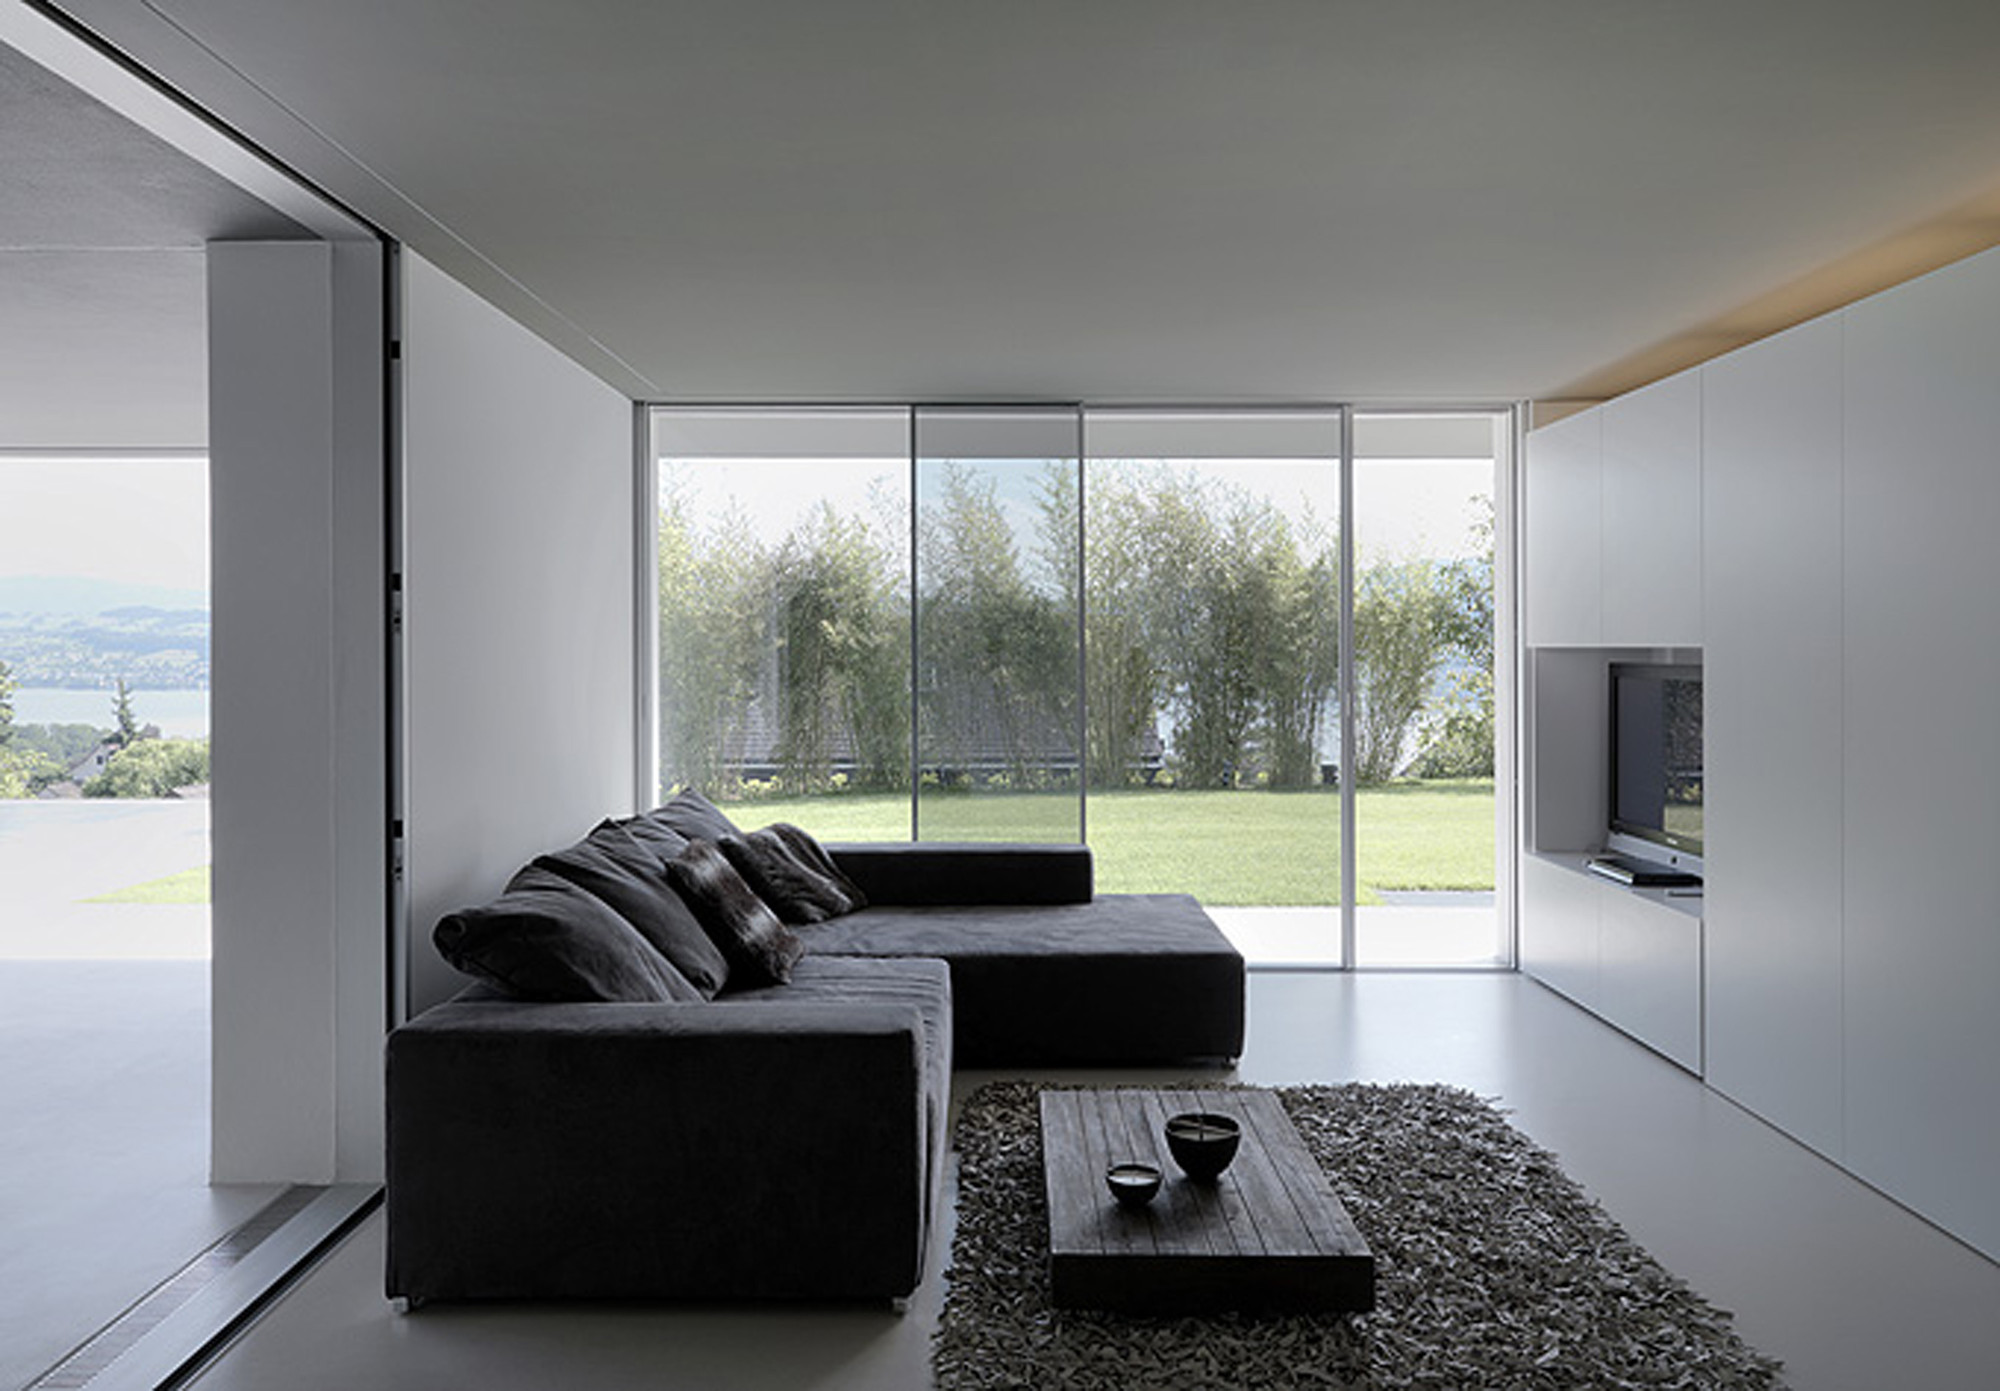 The feldbalz house by gus w stemann architects in zurich for Case interni da sogno